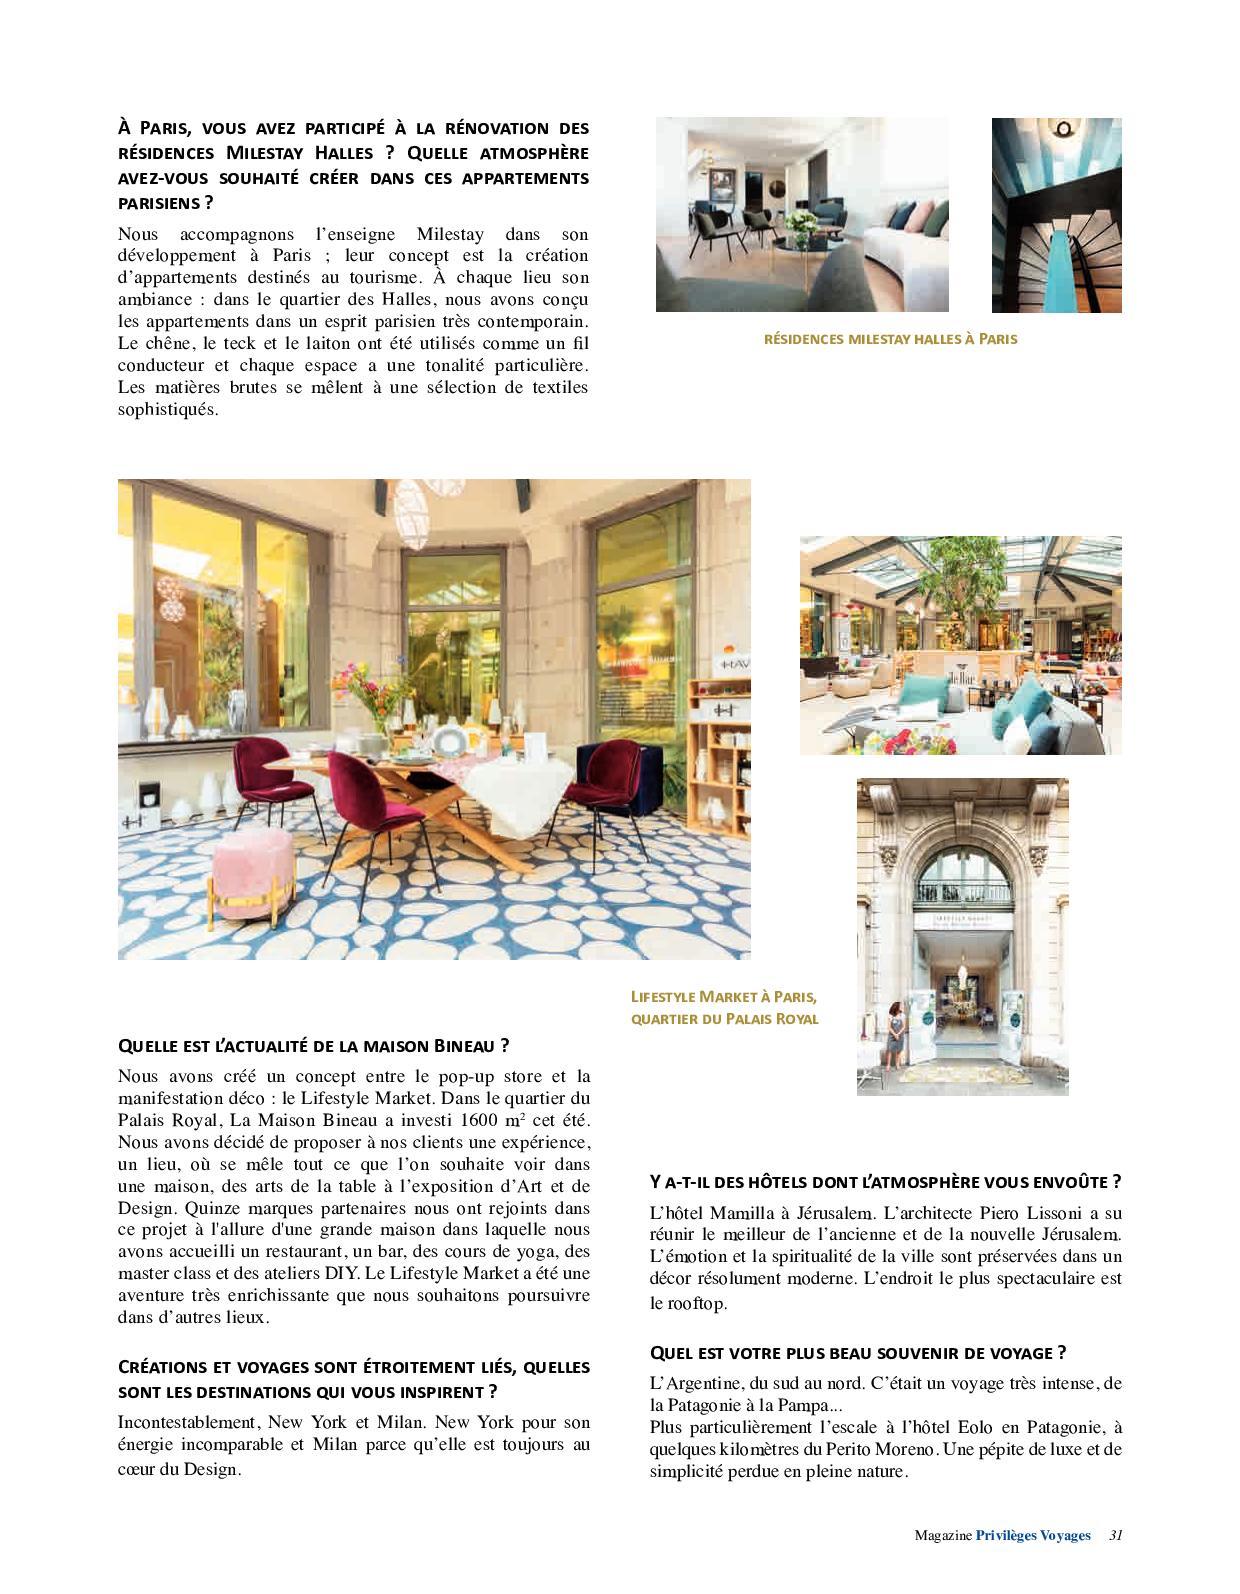 Maison Du Nord Magazine envolees voyages n°5 - 2019 - calameo downloader